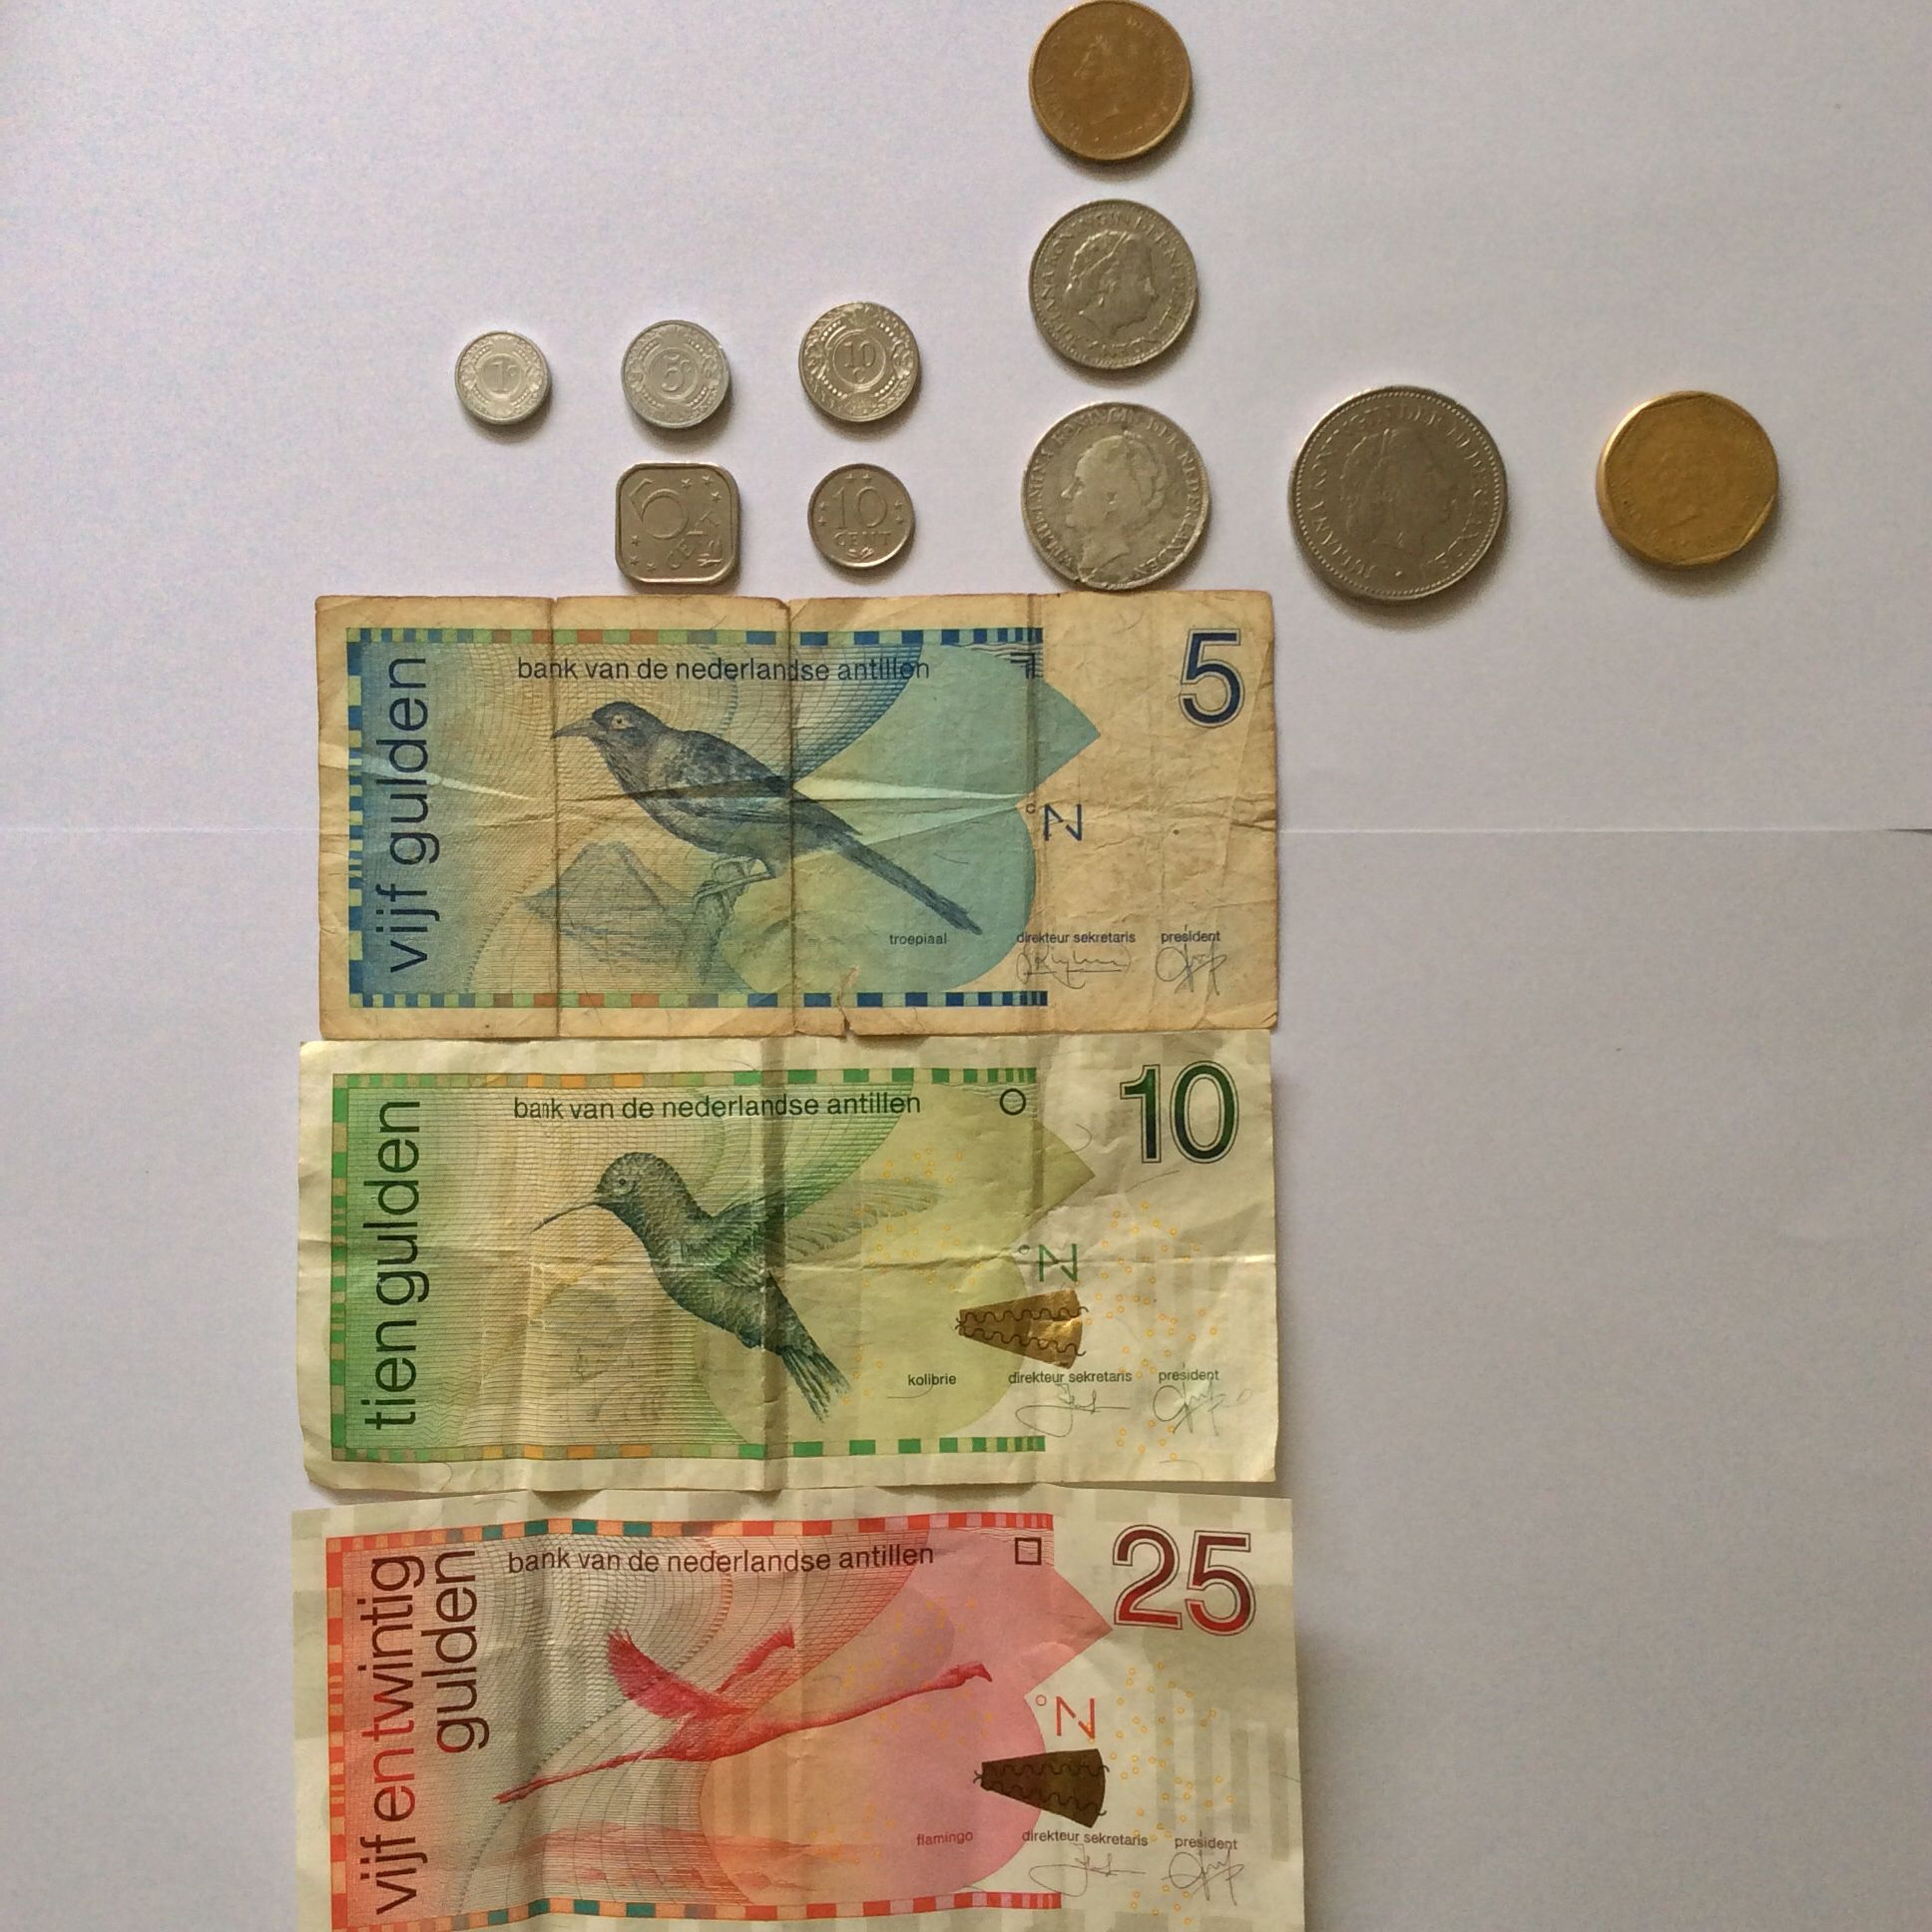 Amex cash advance charges image 2